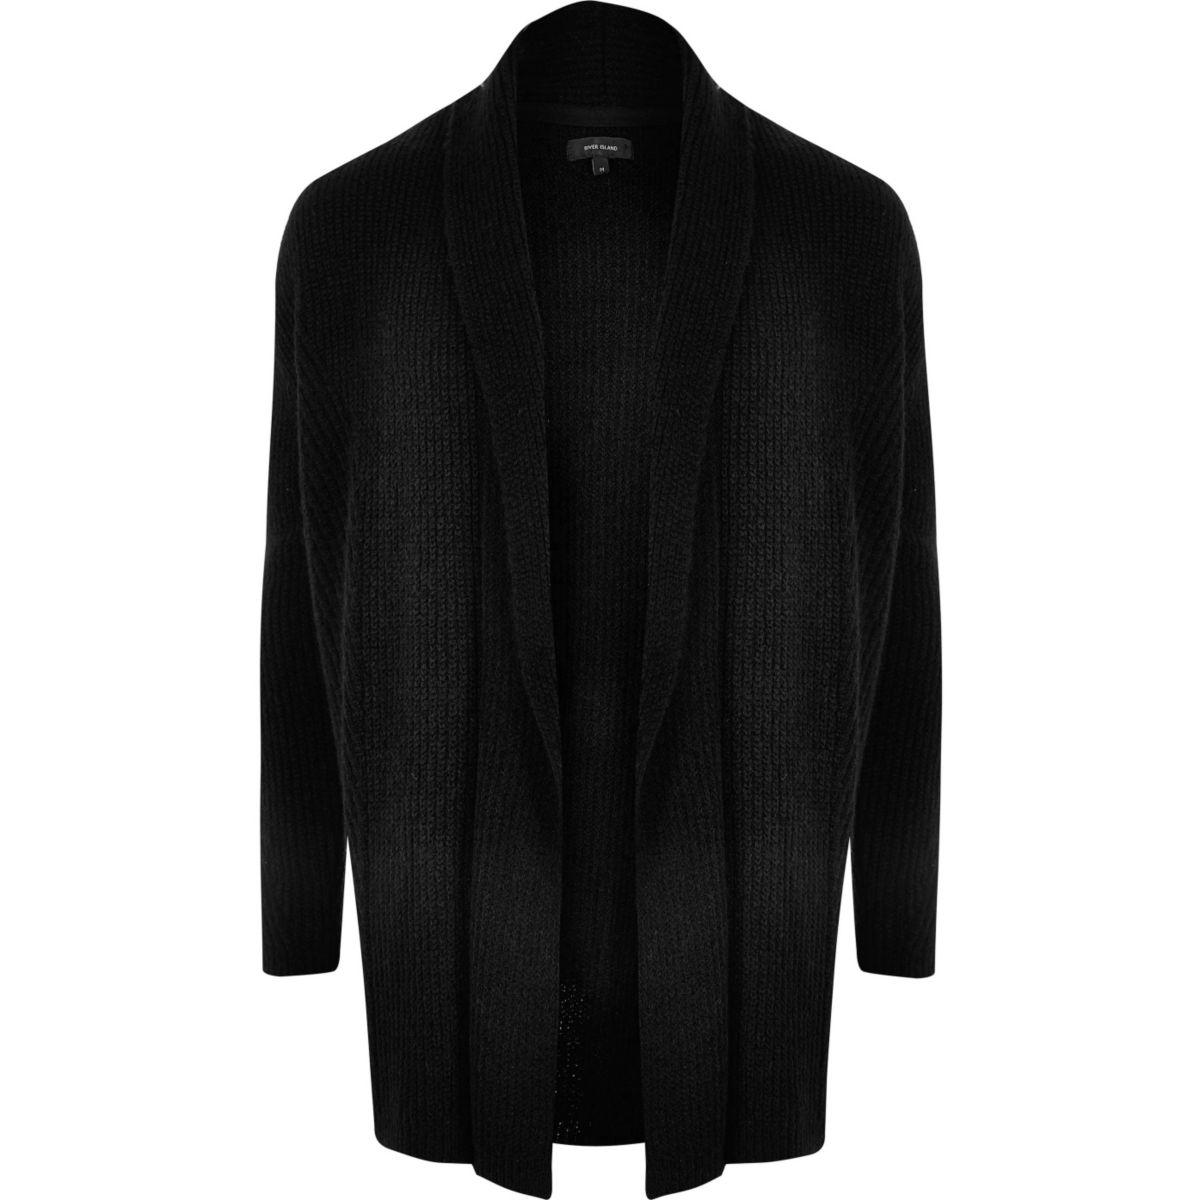 Black ribbed wool blend cardigan